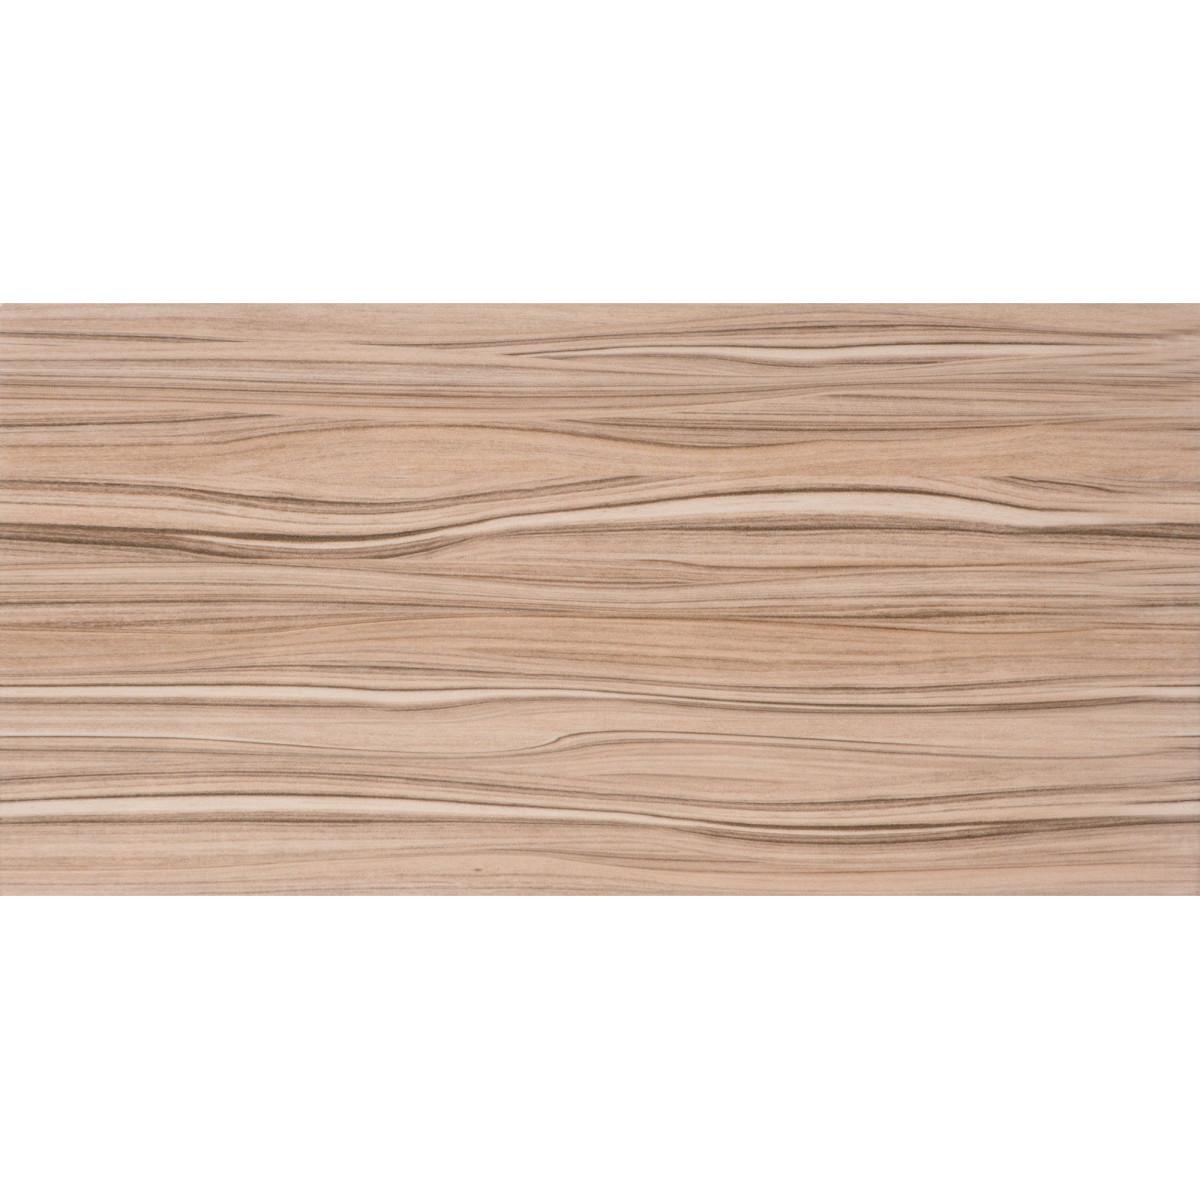 Плитка настенная Плессо 50х24.9 см 1.494 м2 цвет бежевый